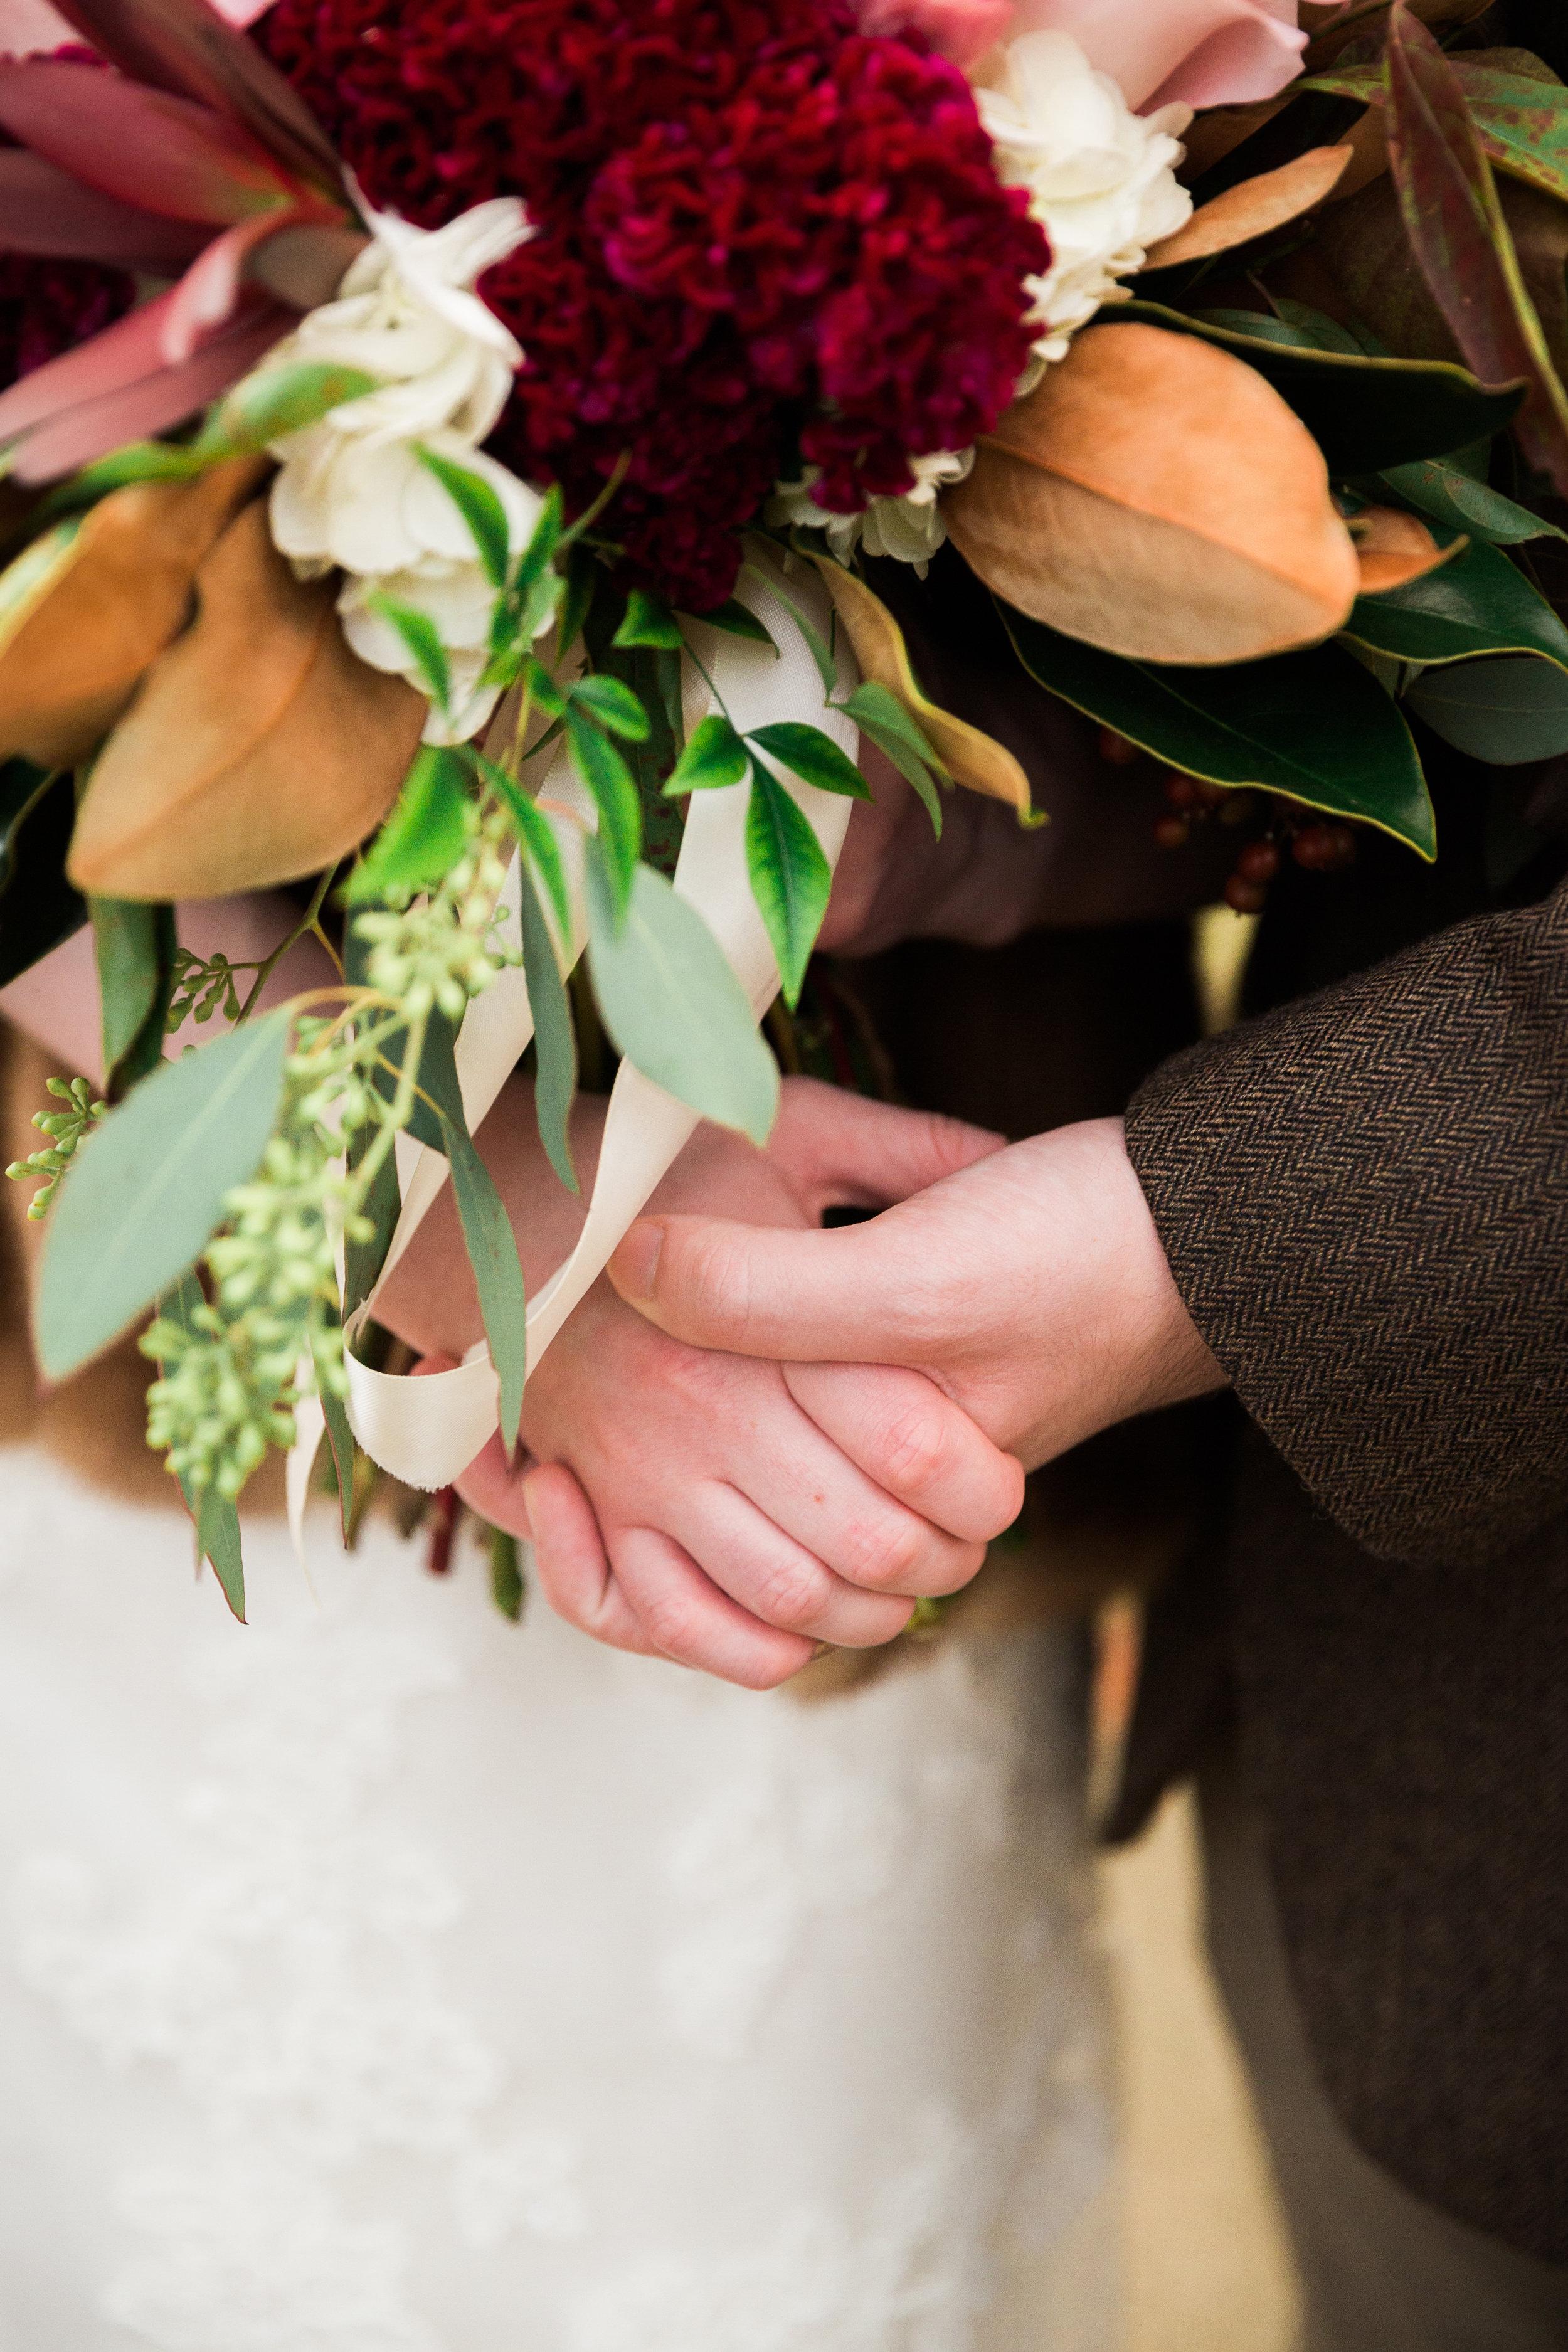 My Wedding - Captured by Matthew Dejesus {Pedantic Foodie}